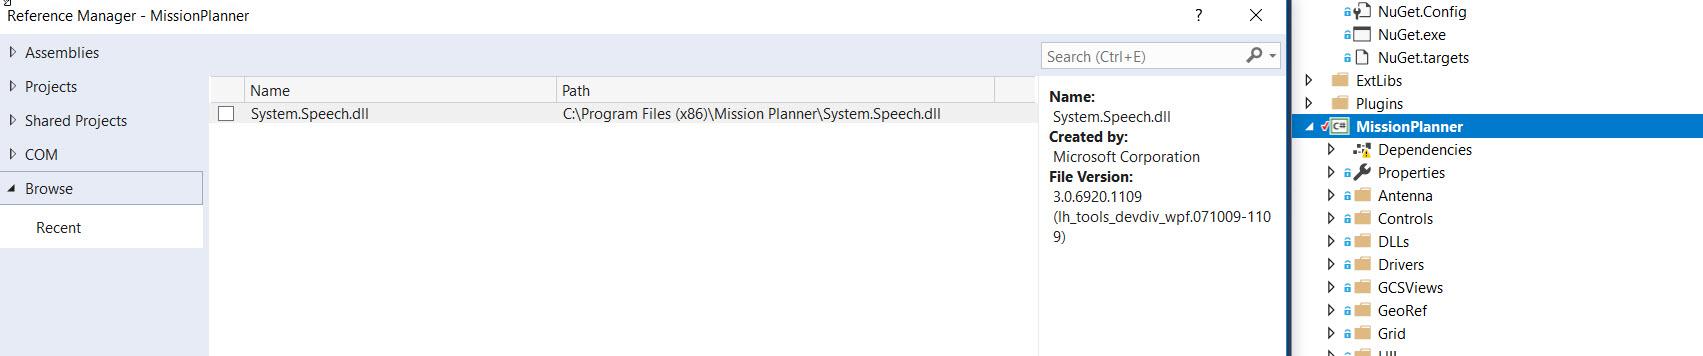 Compiling Mission Planner - Visual Studio Error Code CS1061